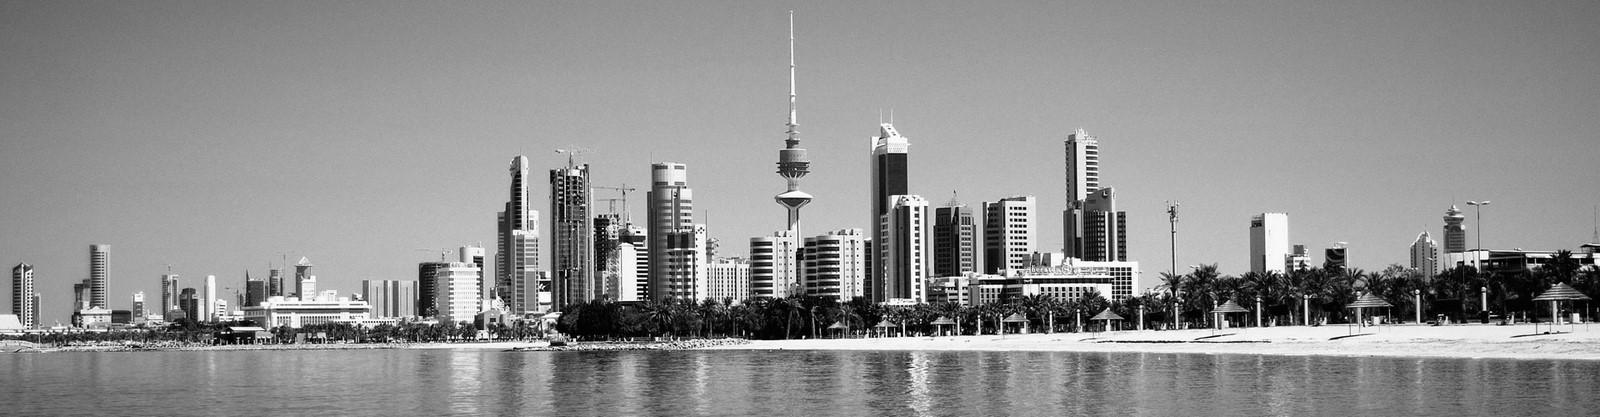 Architectural Development of Kuwait Post War -Sheet1